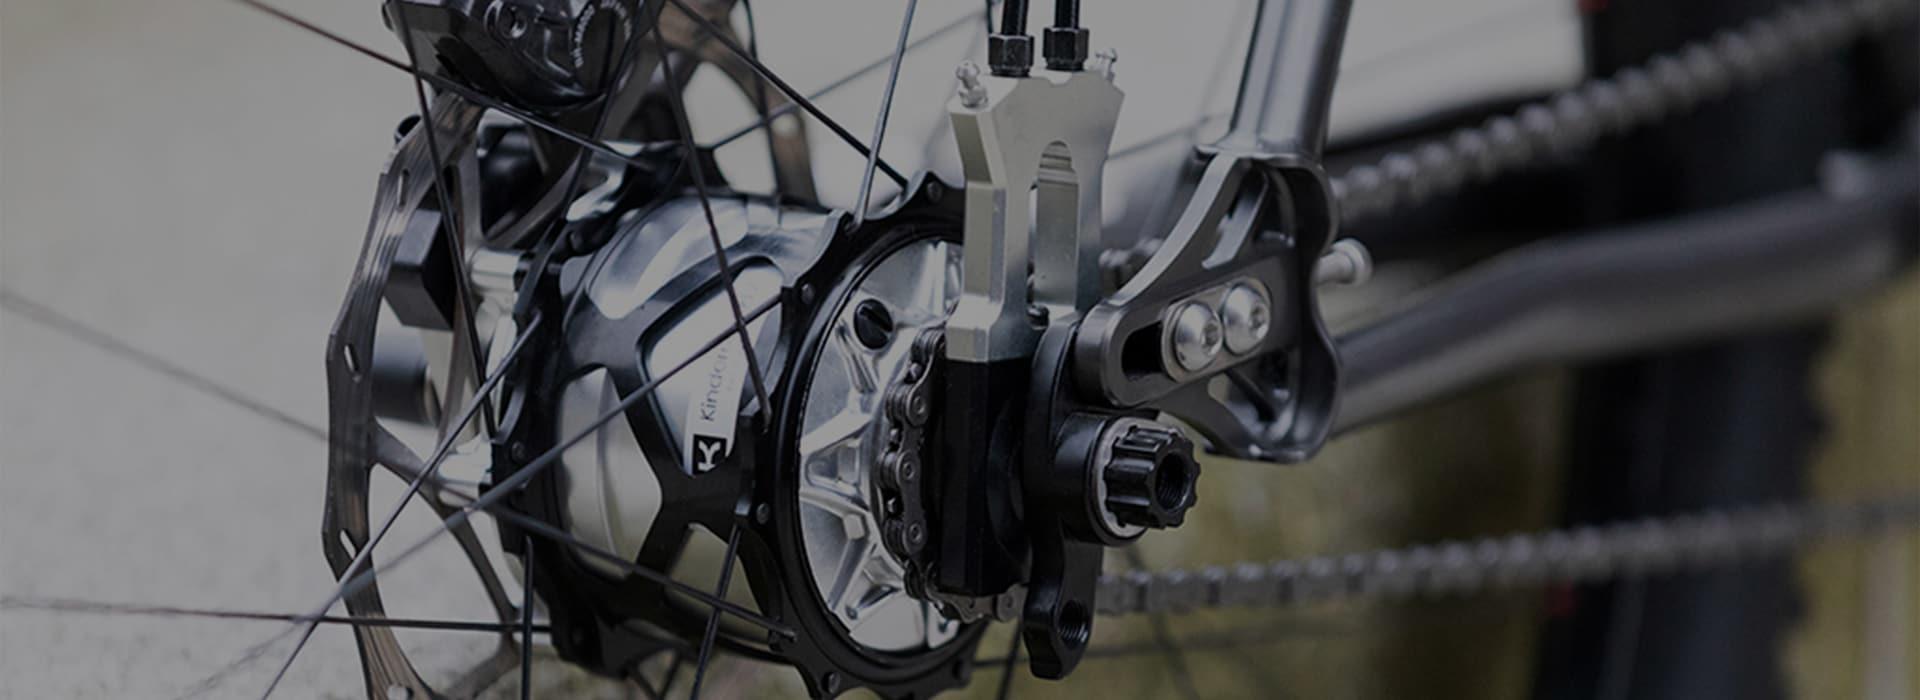 Complete gear hub